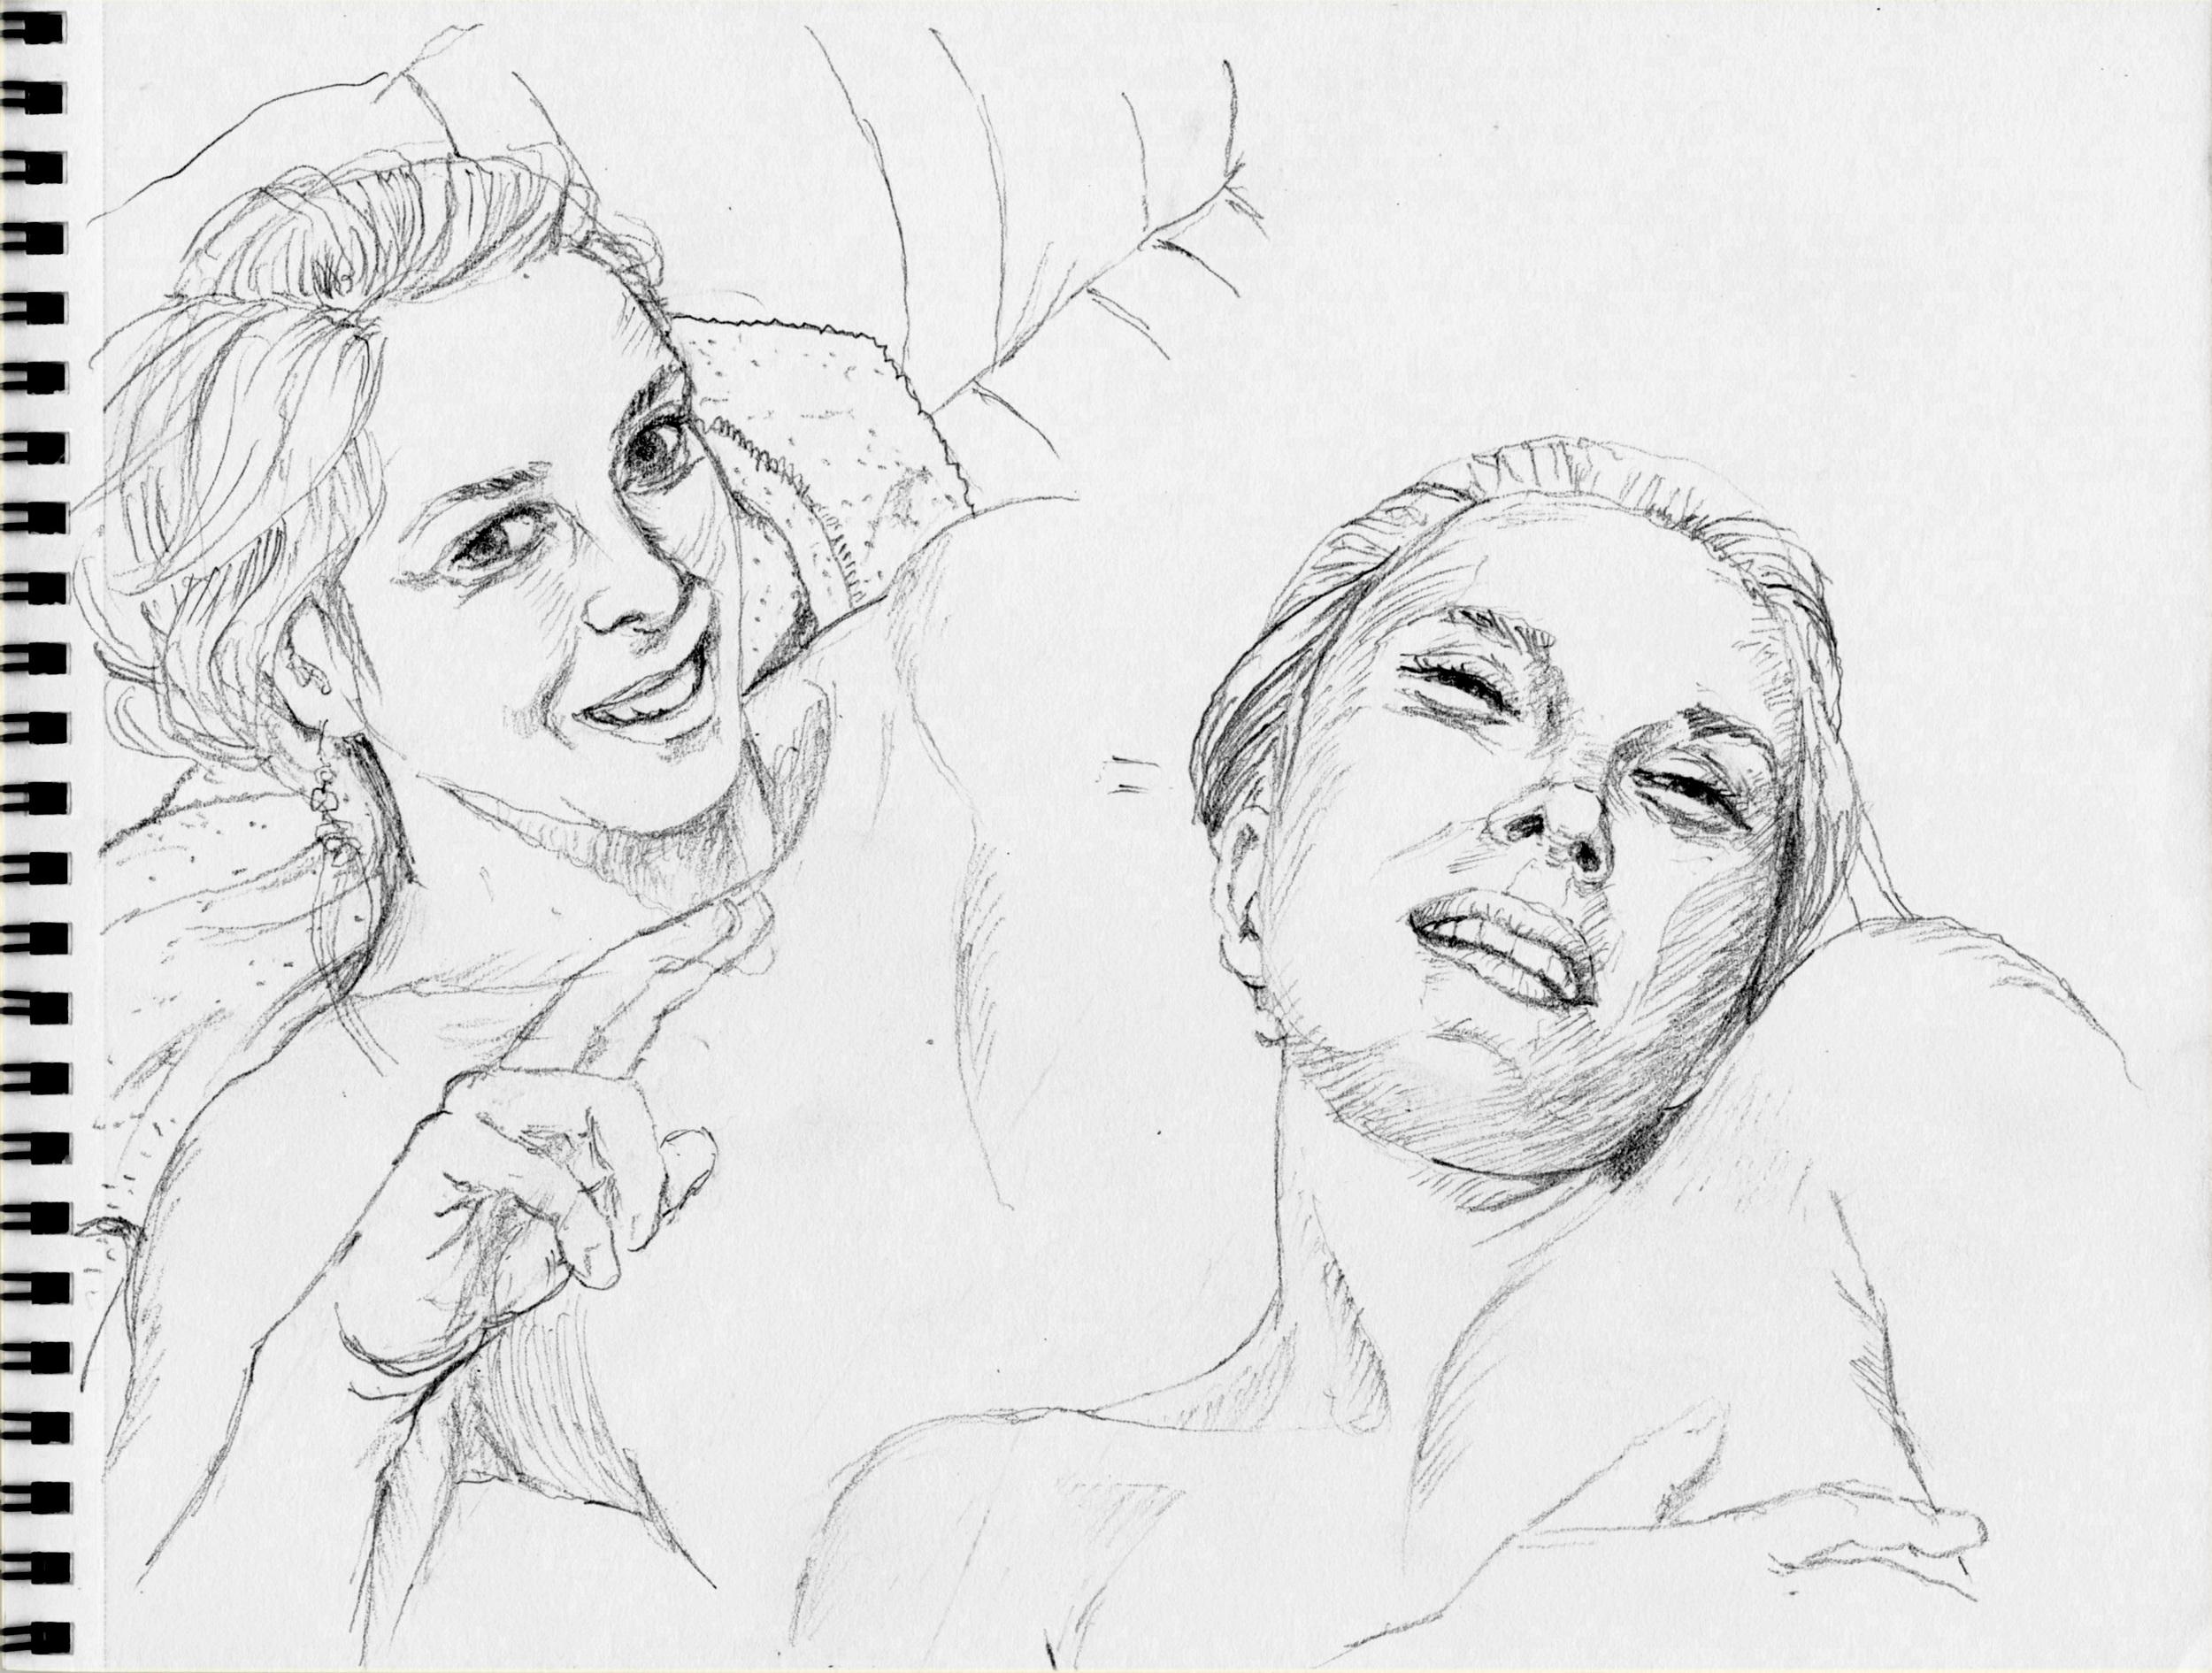 July 2014 sketch439.jpg